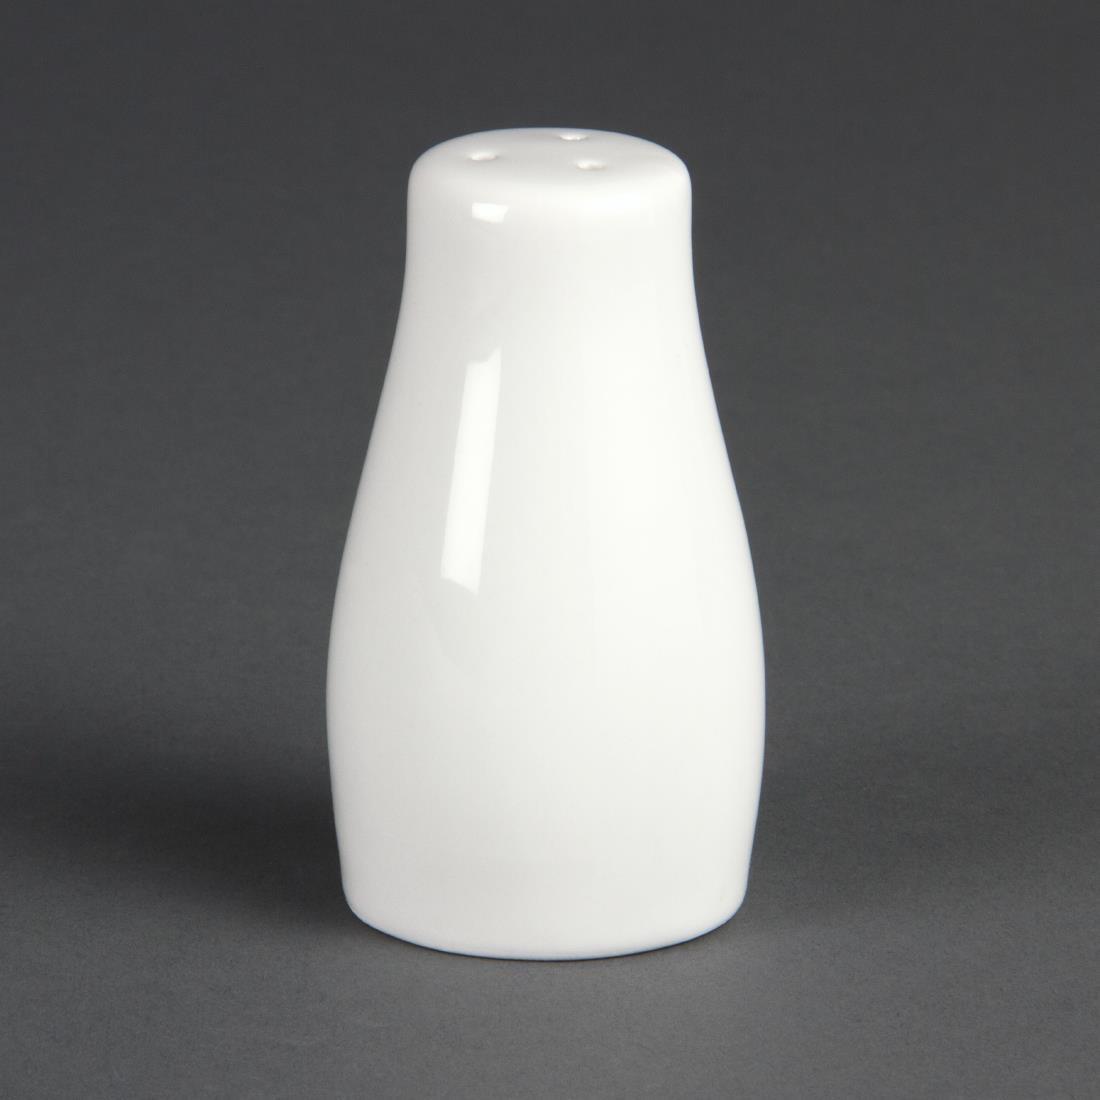 Conical Salt + Pepper Shaker